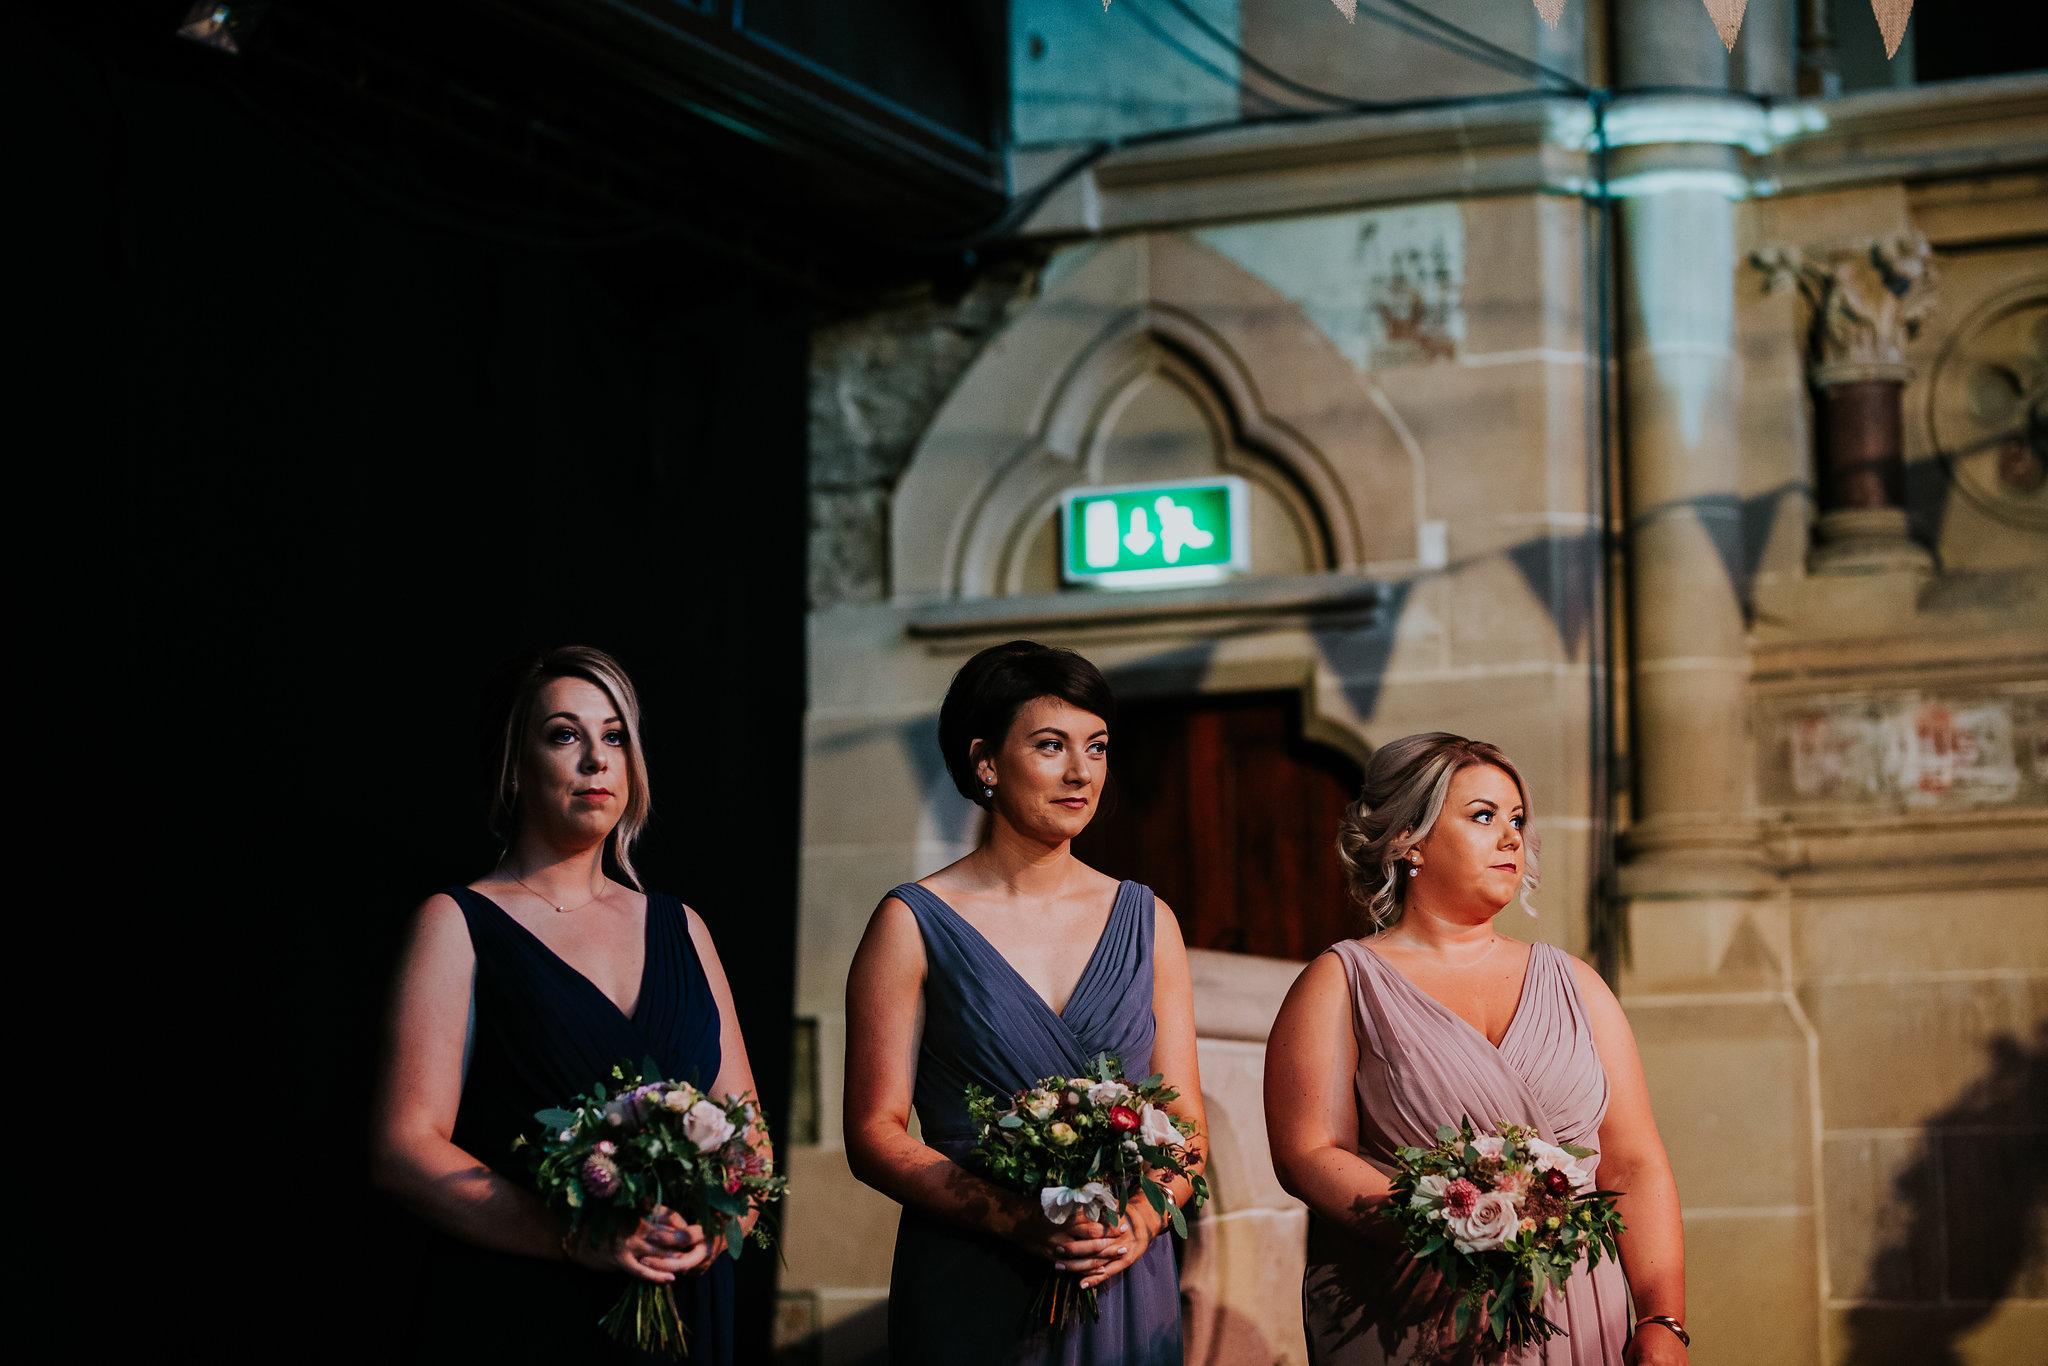 Cottiers wedding lavender and rose wedding florists scotland8.jpg